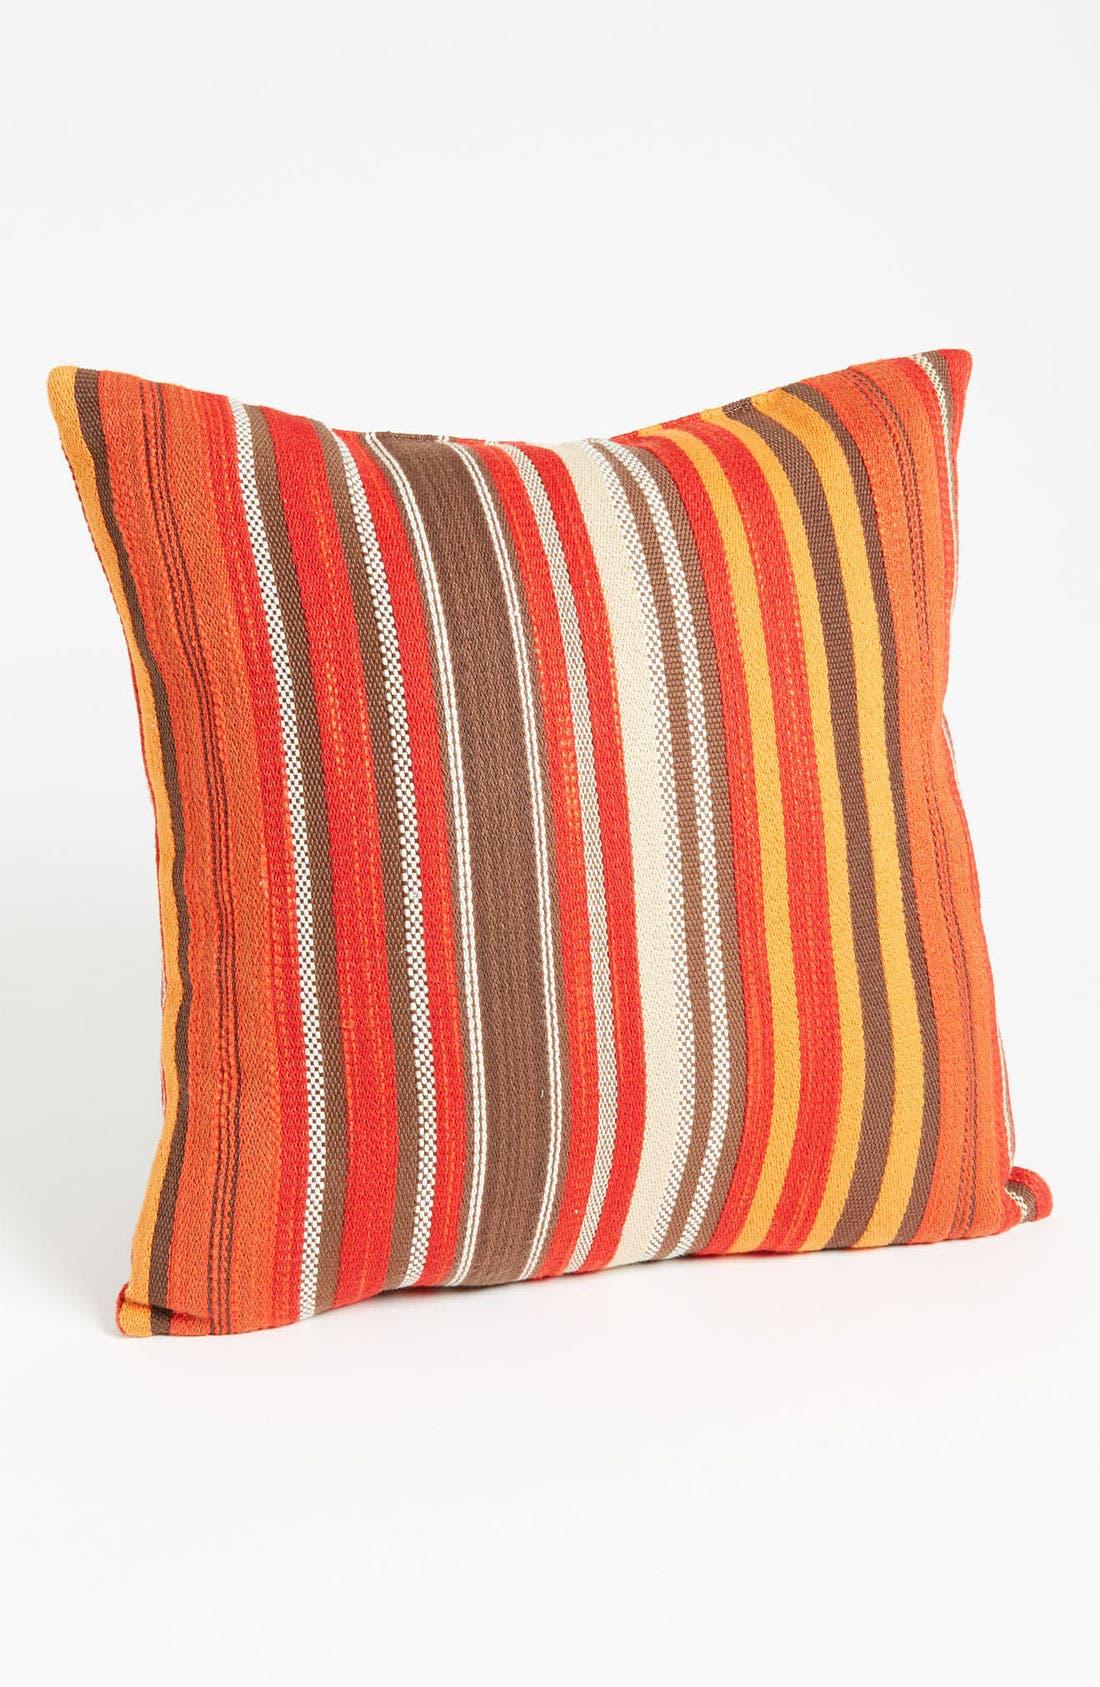 Alternate Image 1 Selected - Brentwood Originals 'Mackinaw' Stripe Pillow